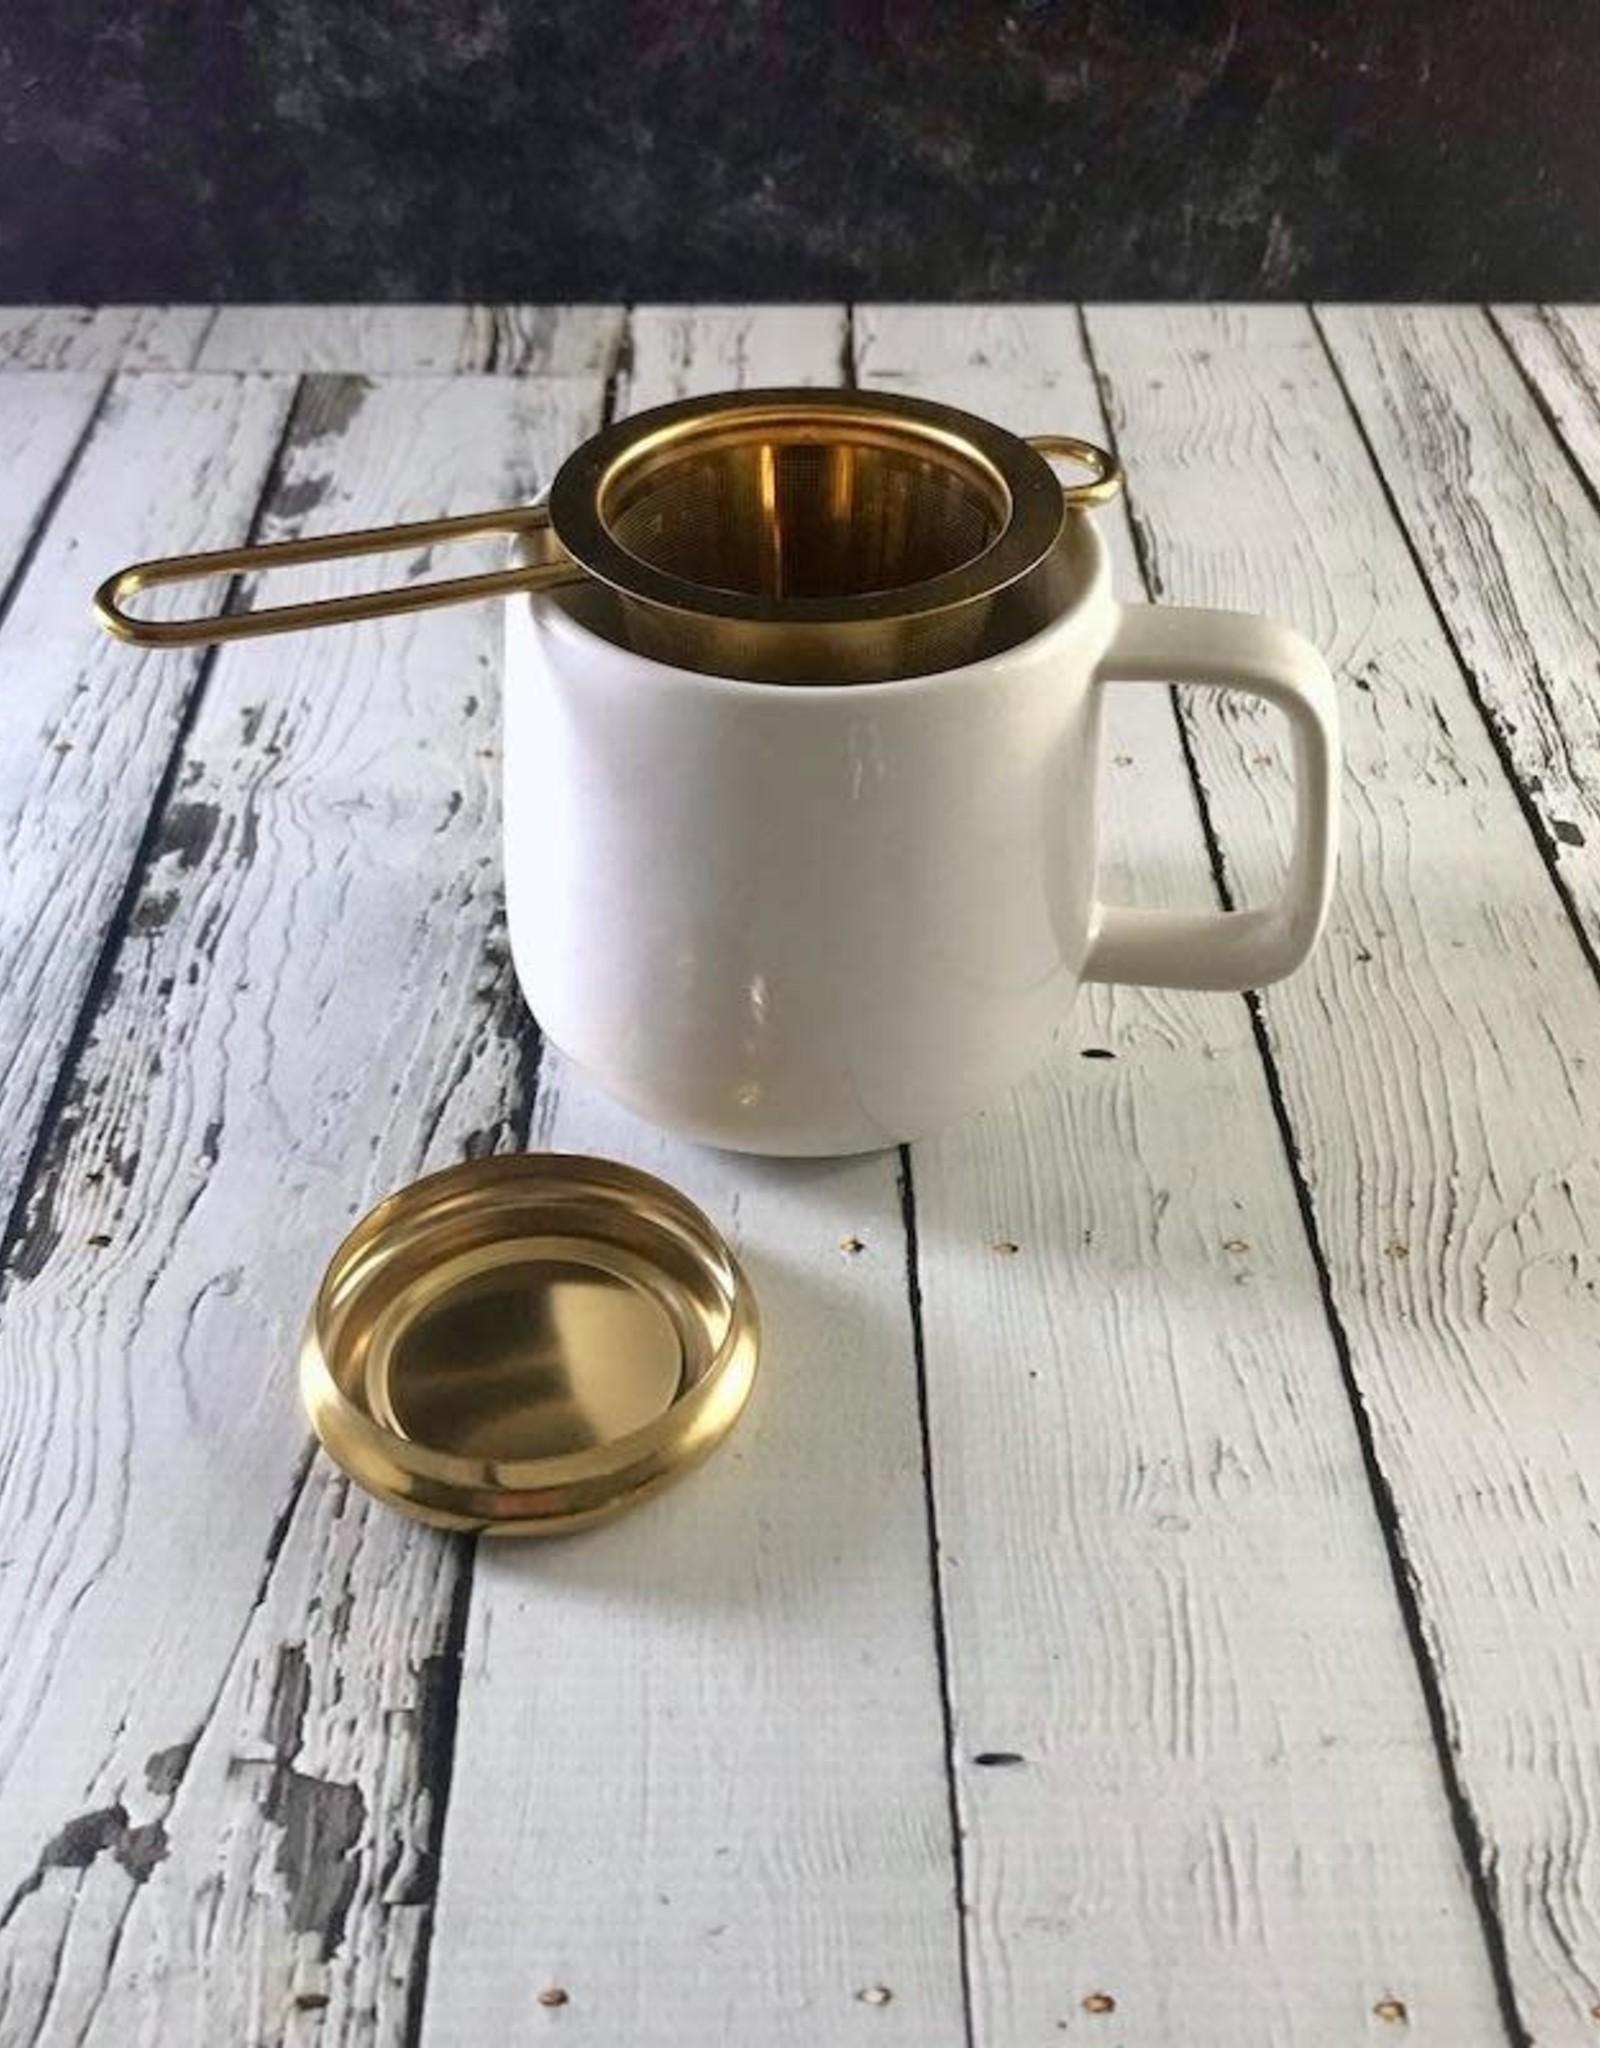 Terra Luna Gold Stainless Steel Tea Infuser